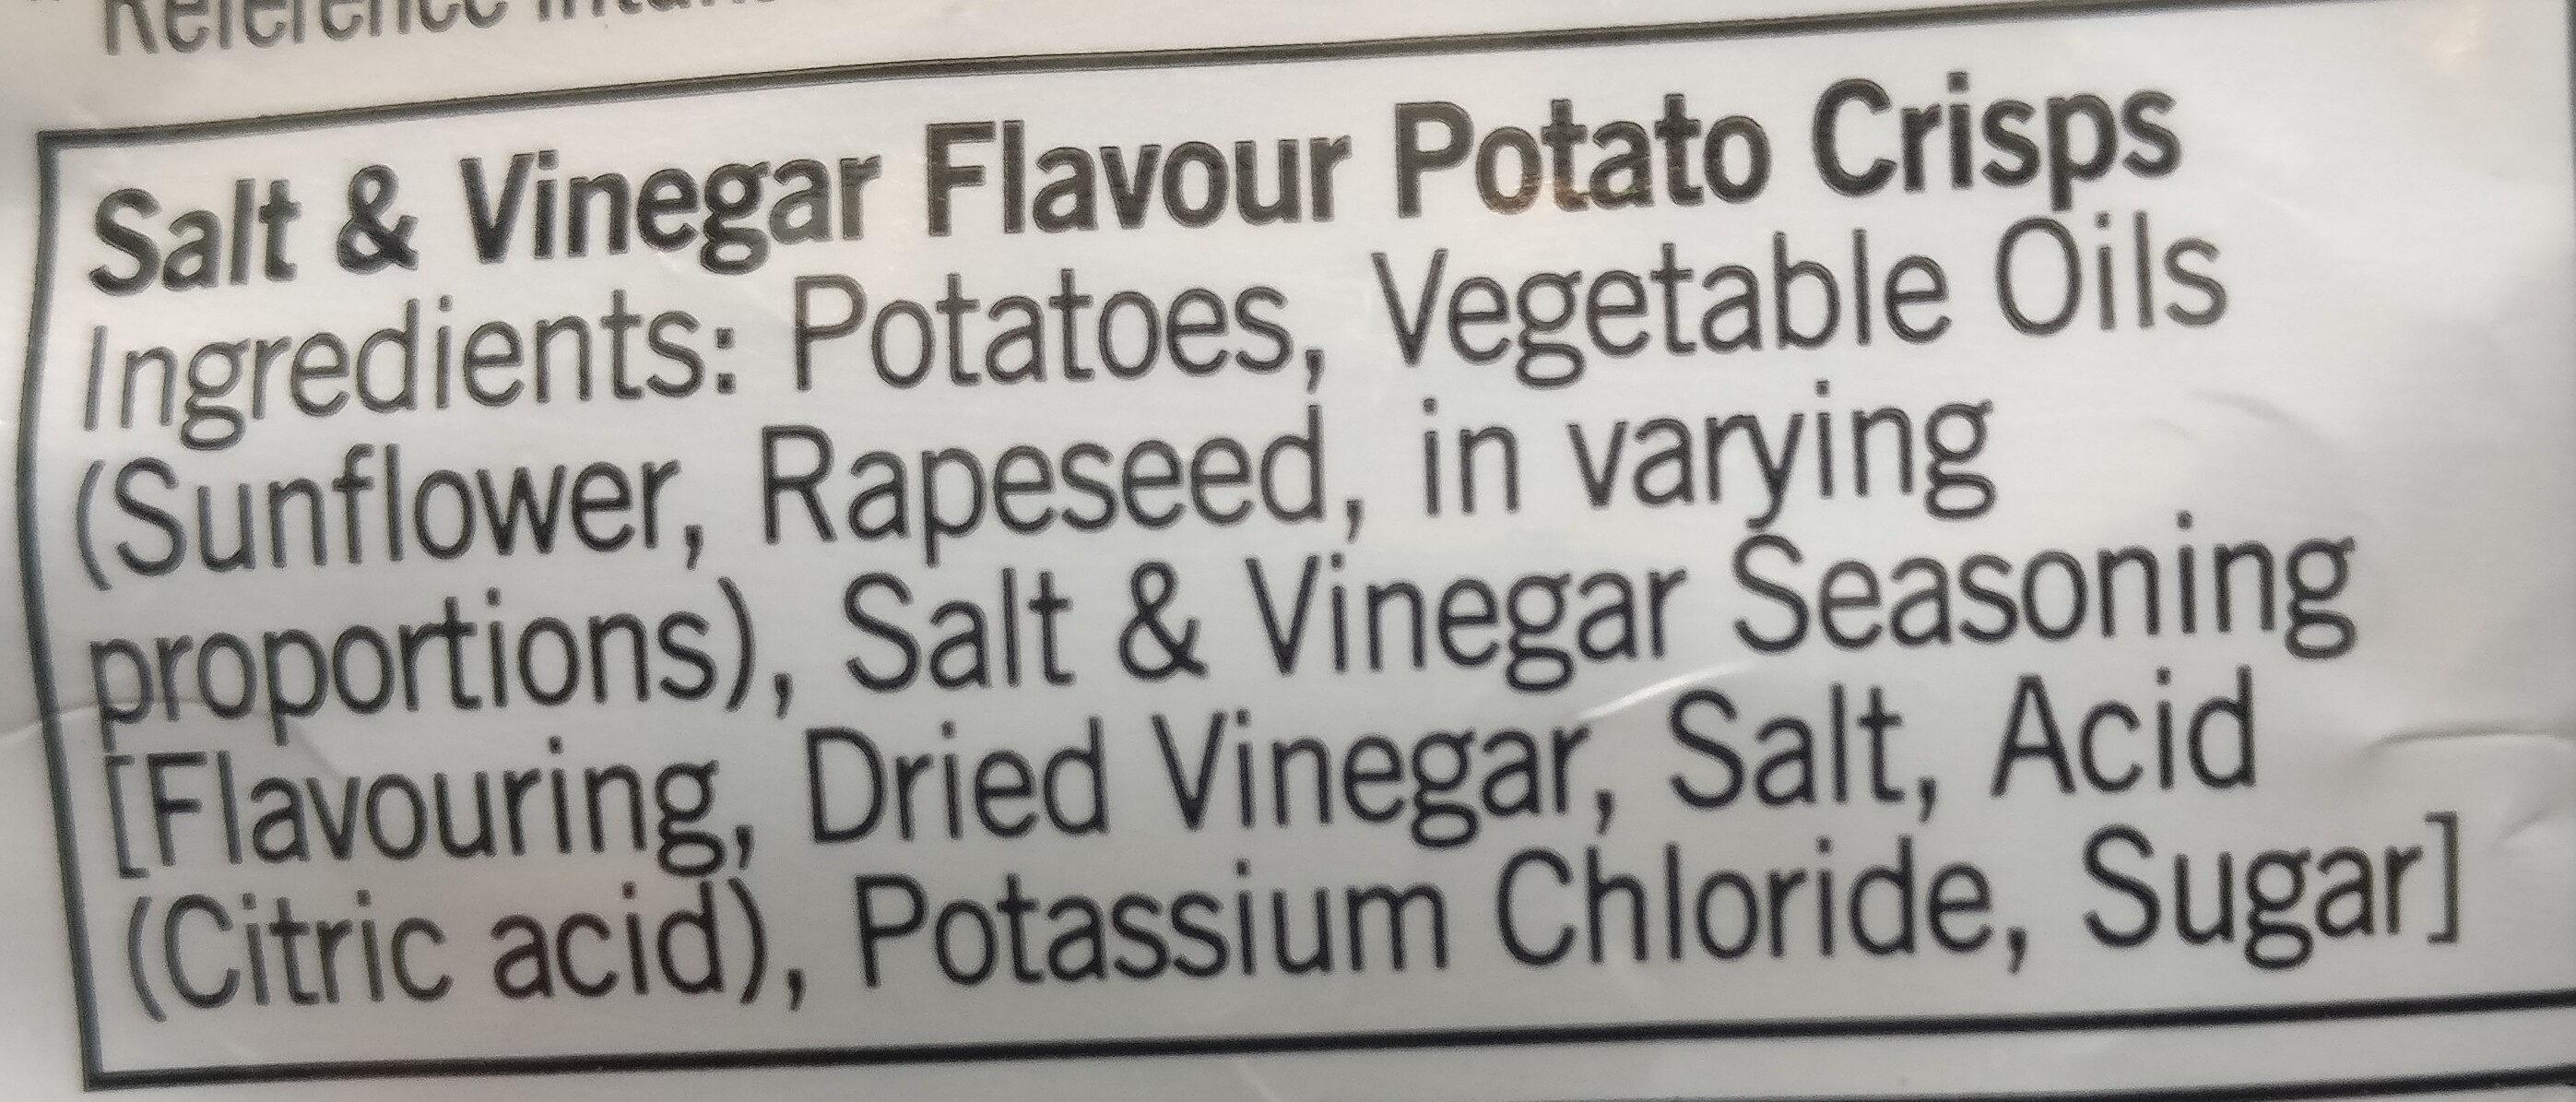 Salt and Vinegar Crisps - Ingredients - en